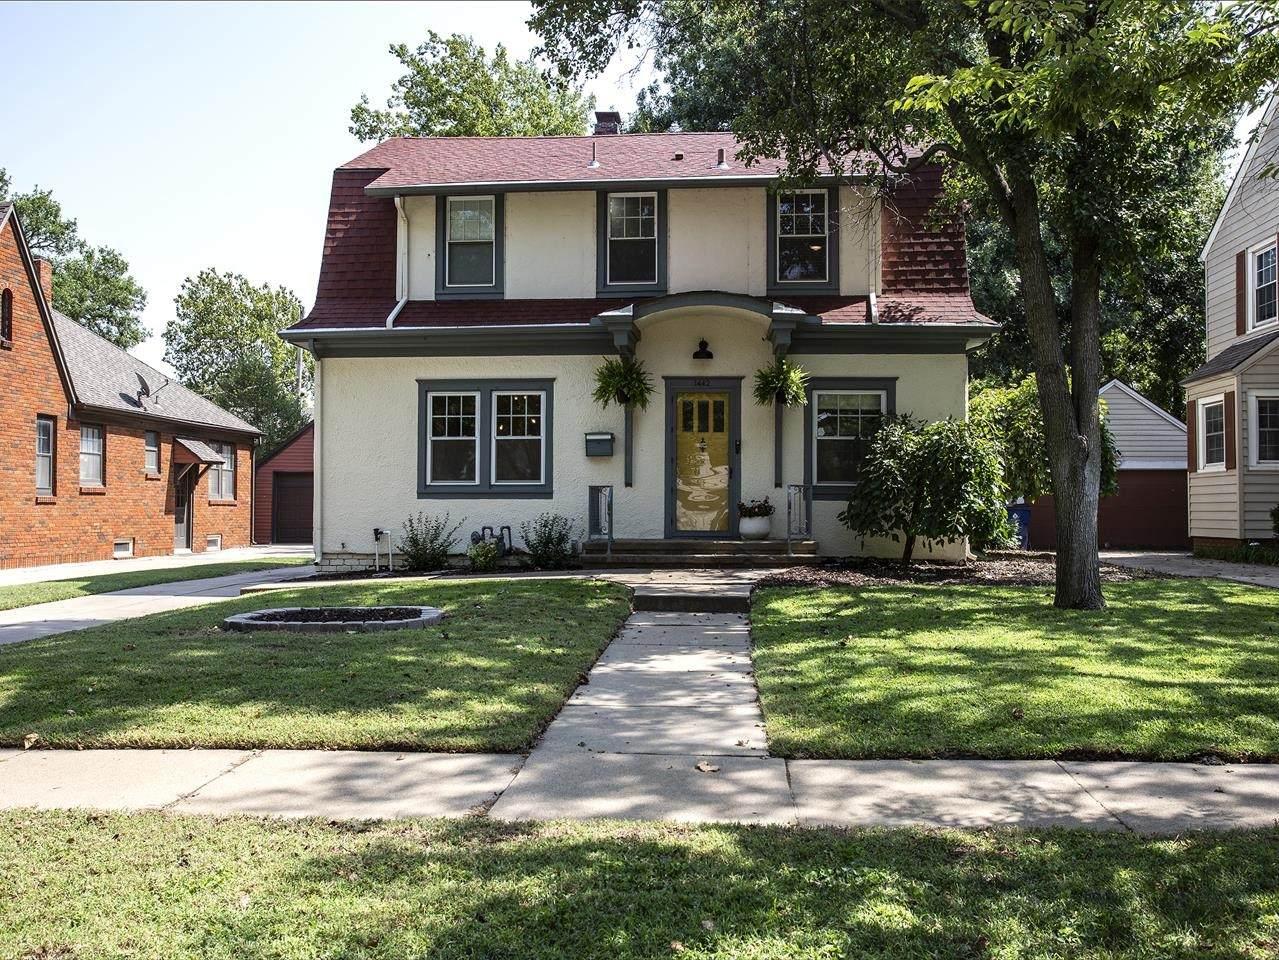 1442 Woodrow Ave - Photo 1